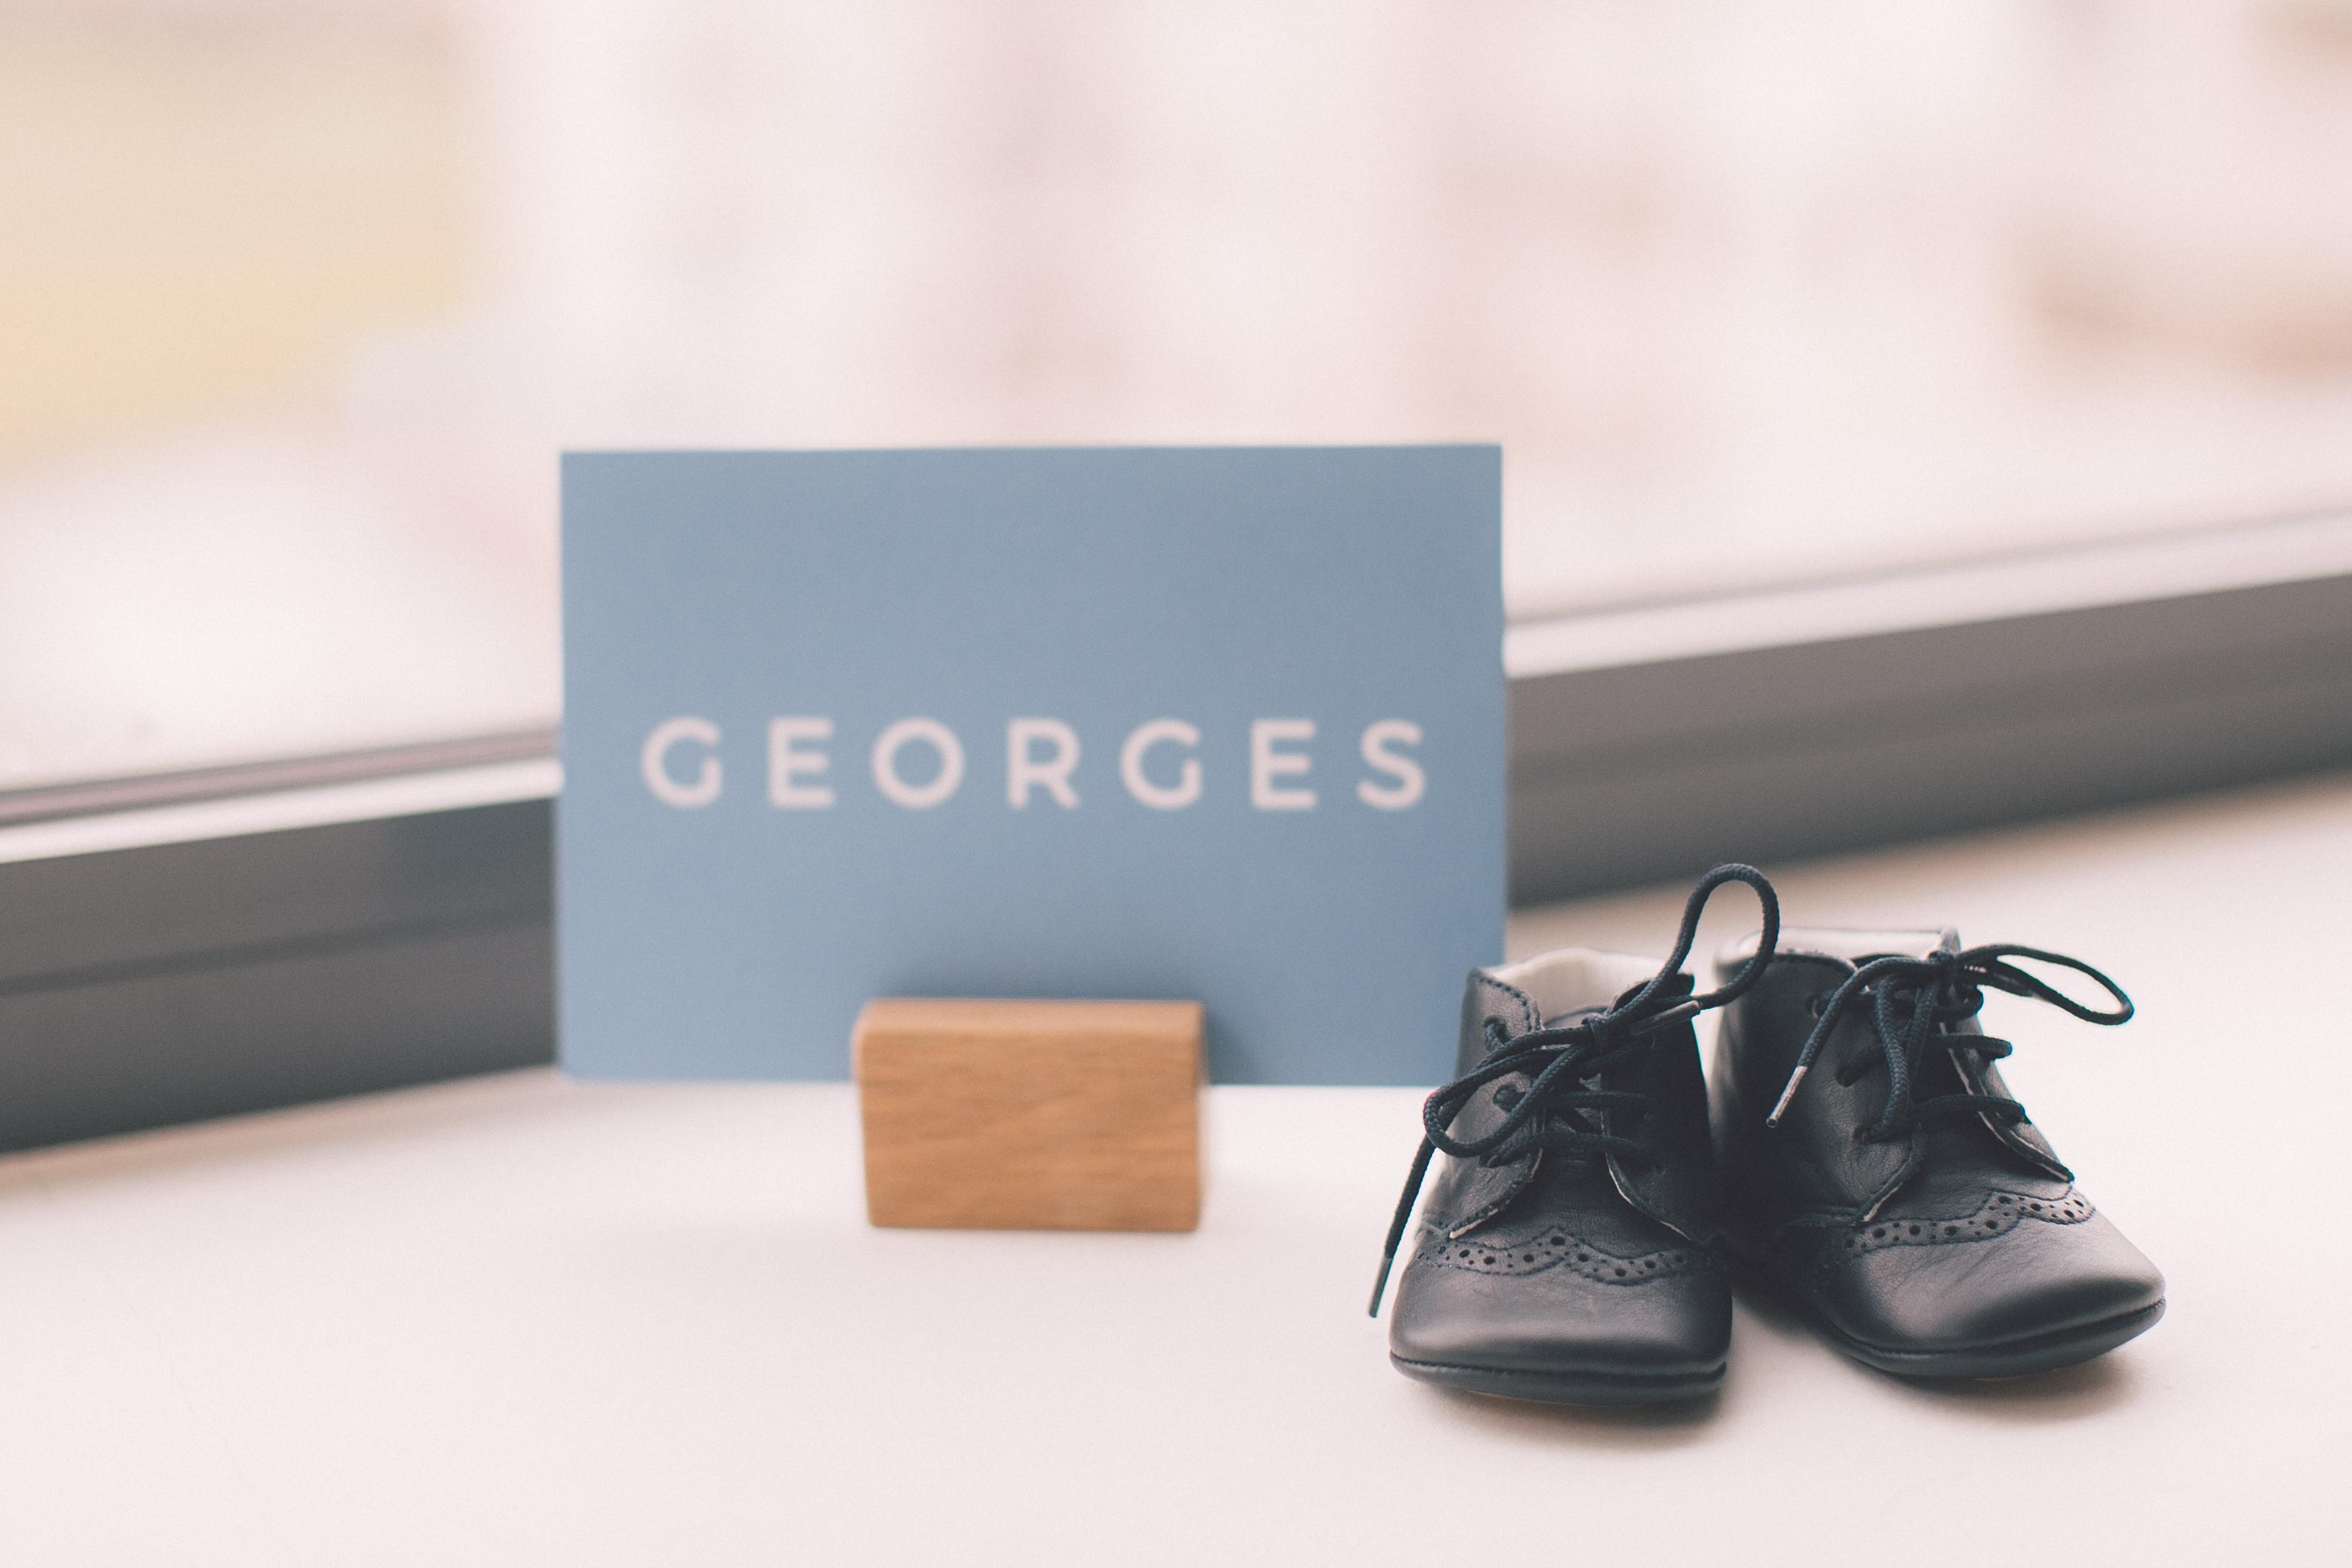 GEORGES-2890